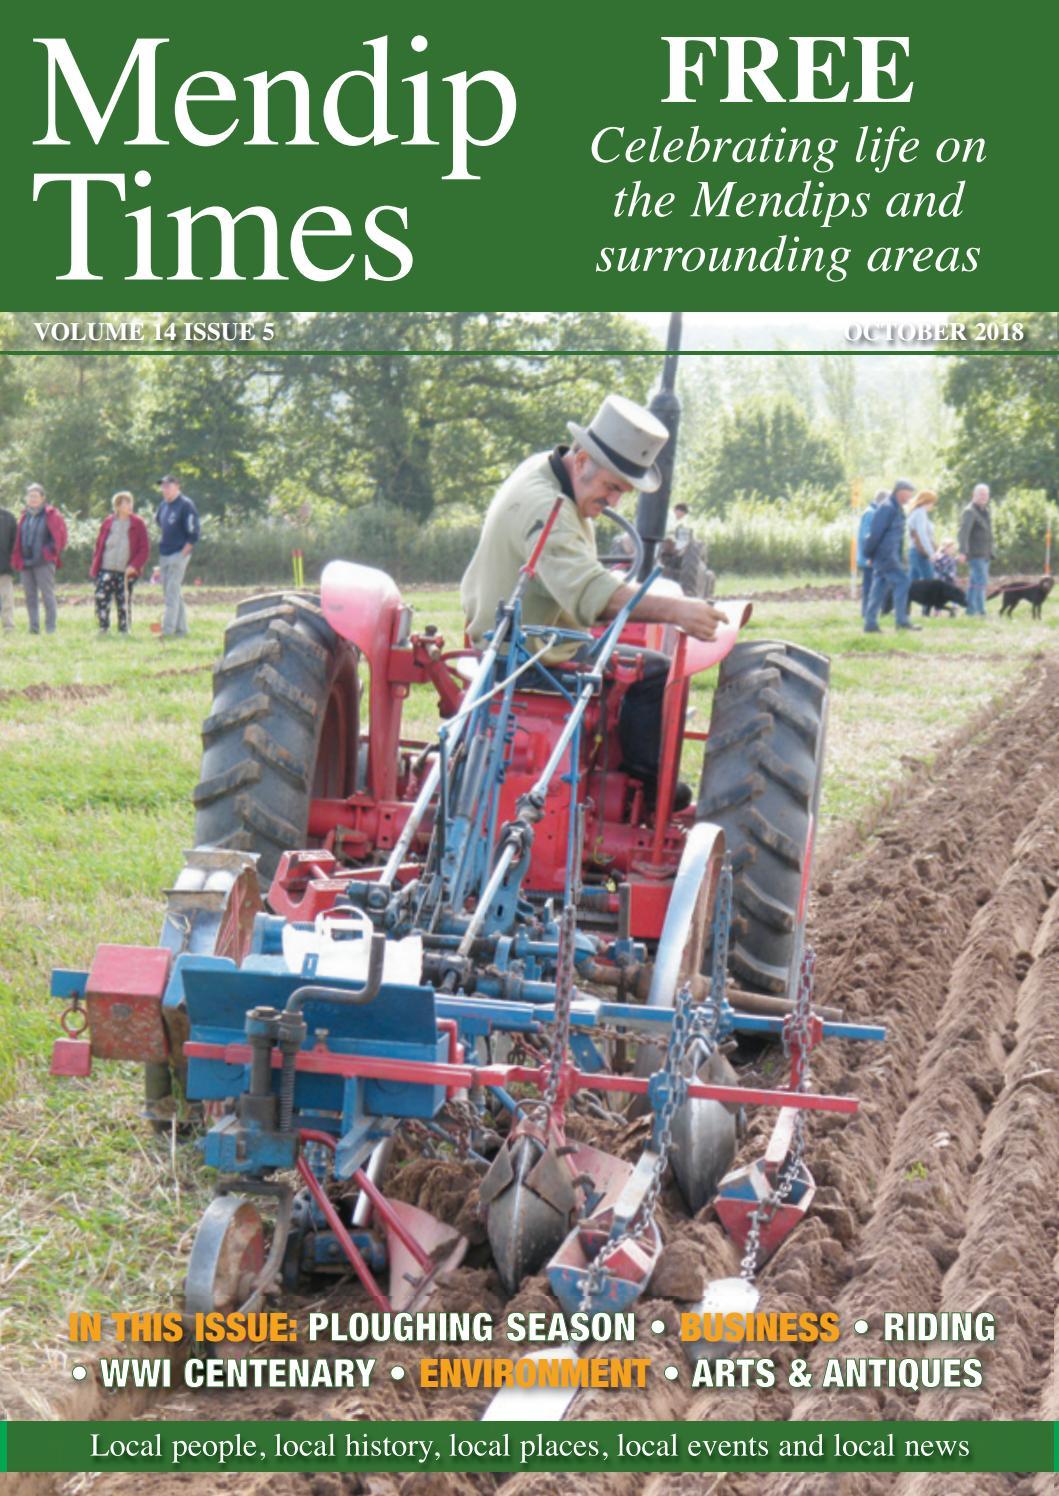 ae07da597a Issue 5 - Volume 14 - Mendip Times by Media Fabrica - issuu